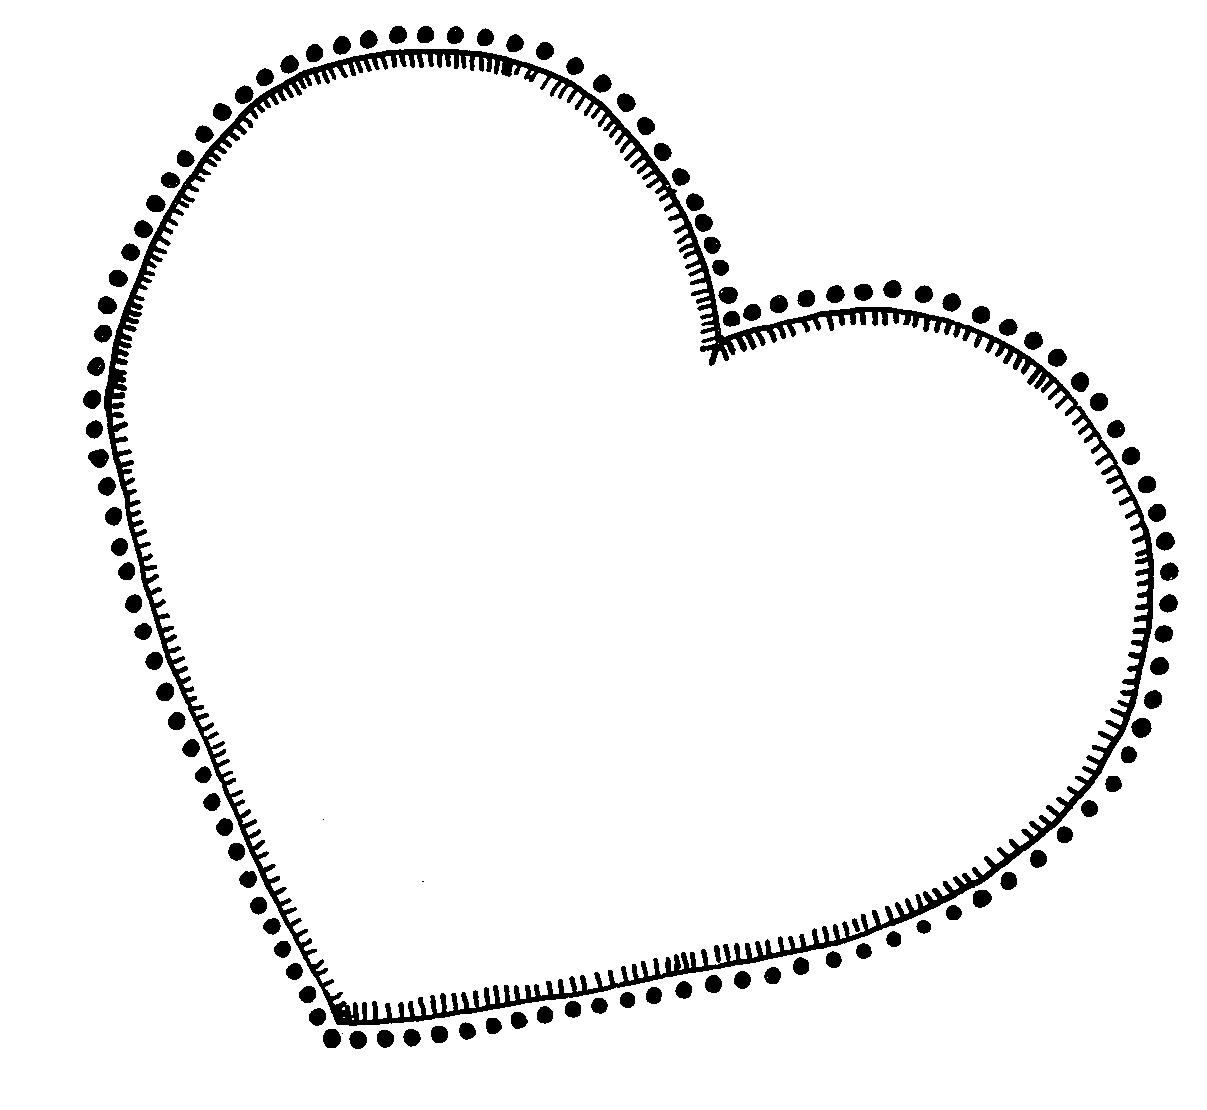 Line Art Heart Outline : Clip art heart outline clipart panda free images